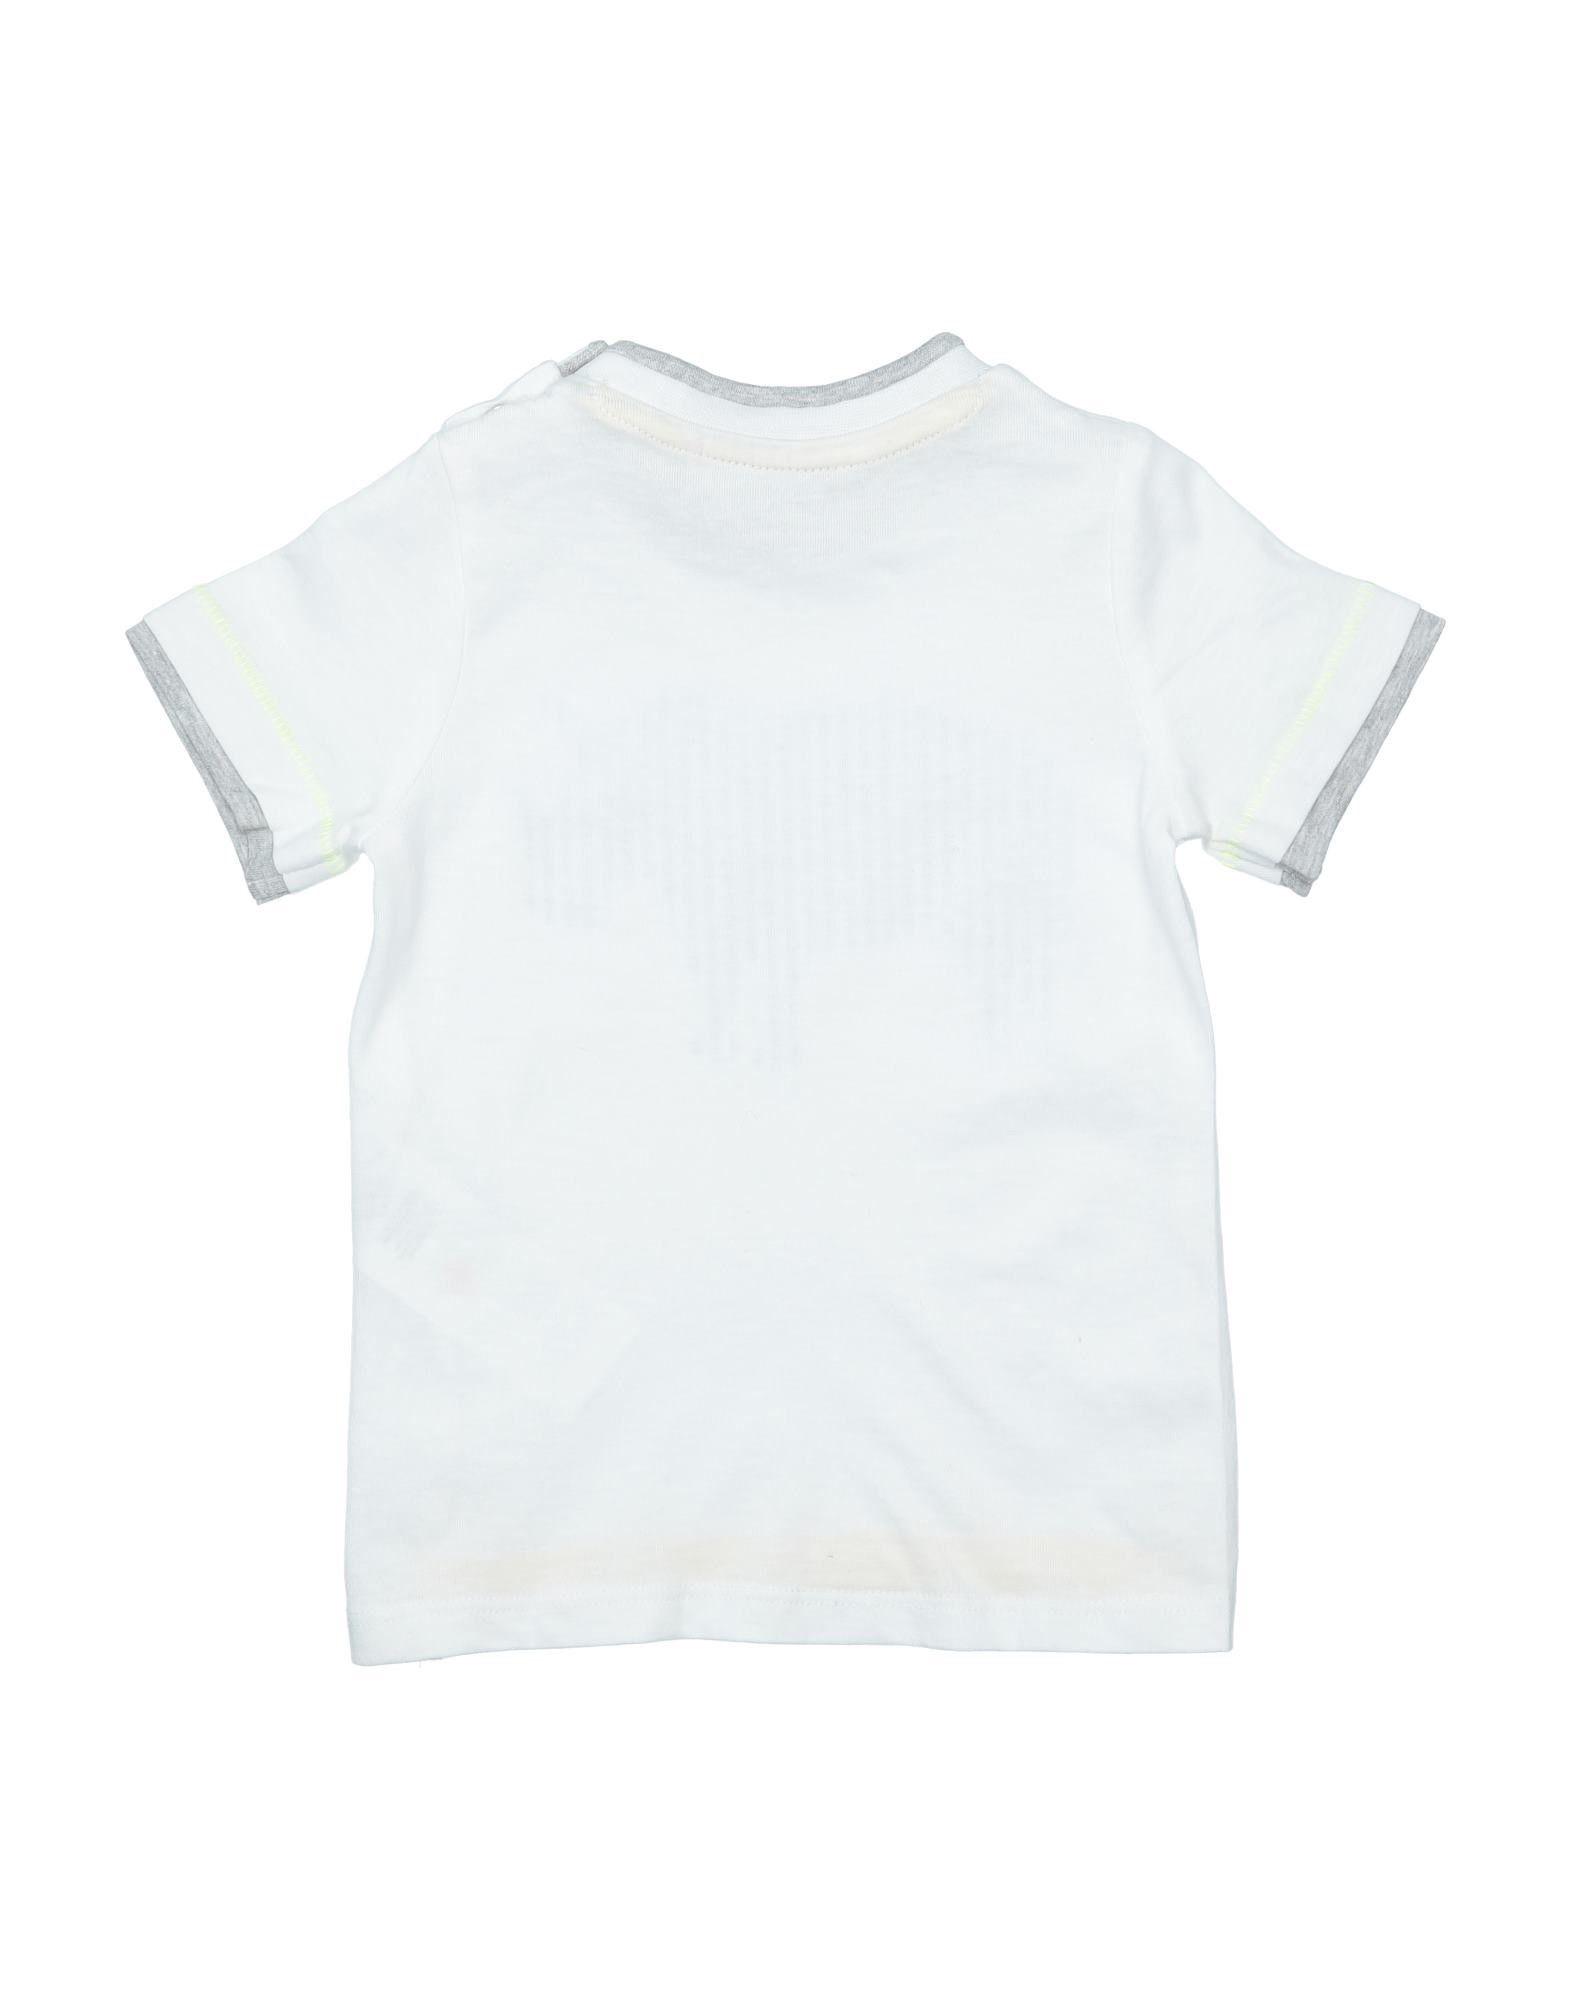 TOPWEAR Boy Esprit White Cotton